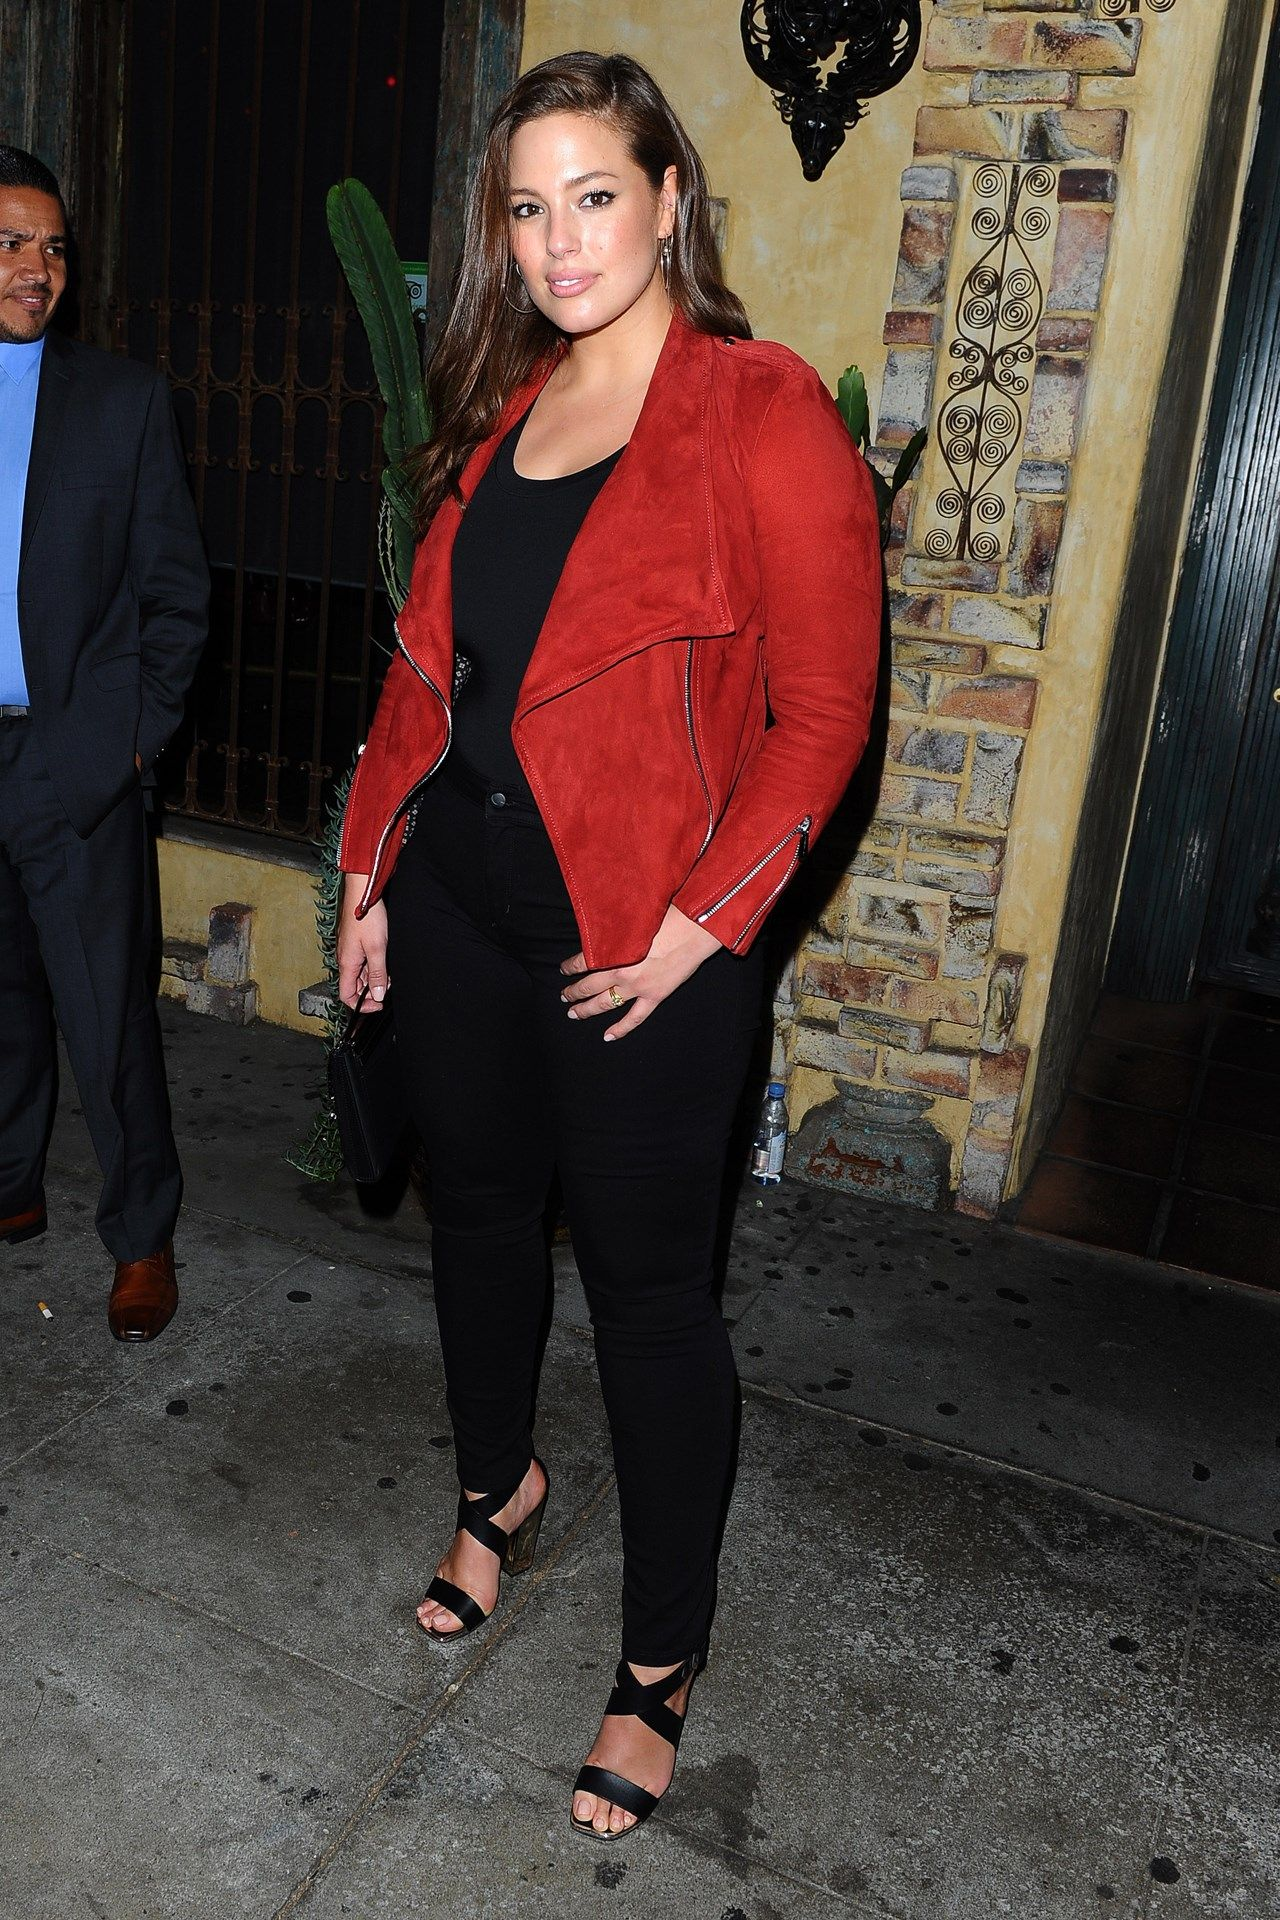 Celebrity Style I Ashley Graham I casual outfit inspiration I red suede biker jacket I trendy leather jacket I plus size outfit inpsiration  @monstylepin